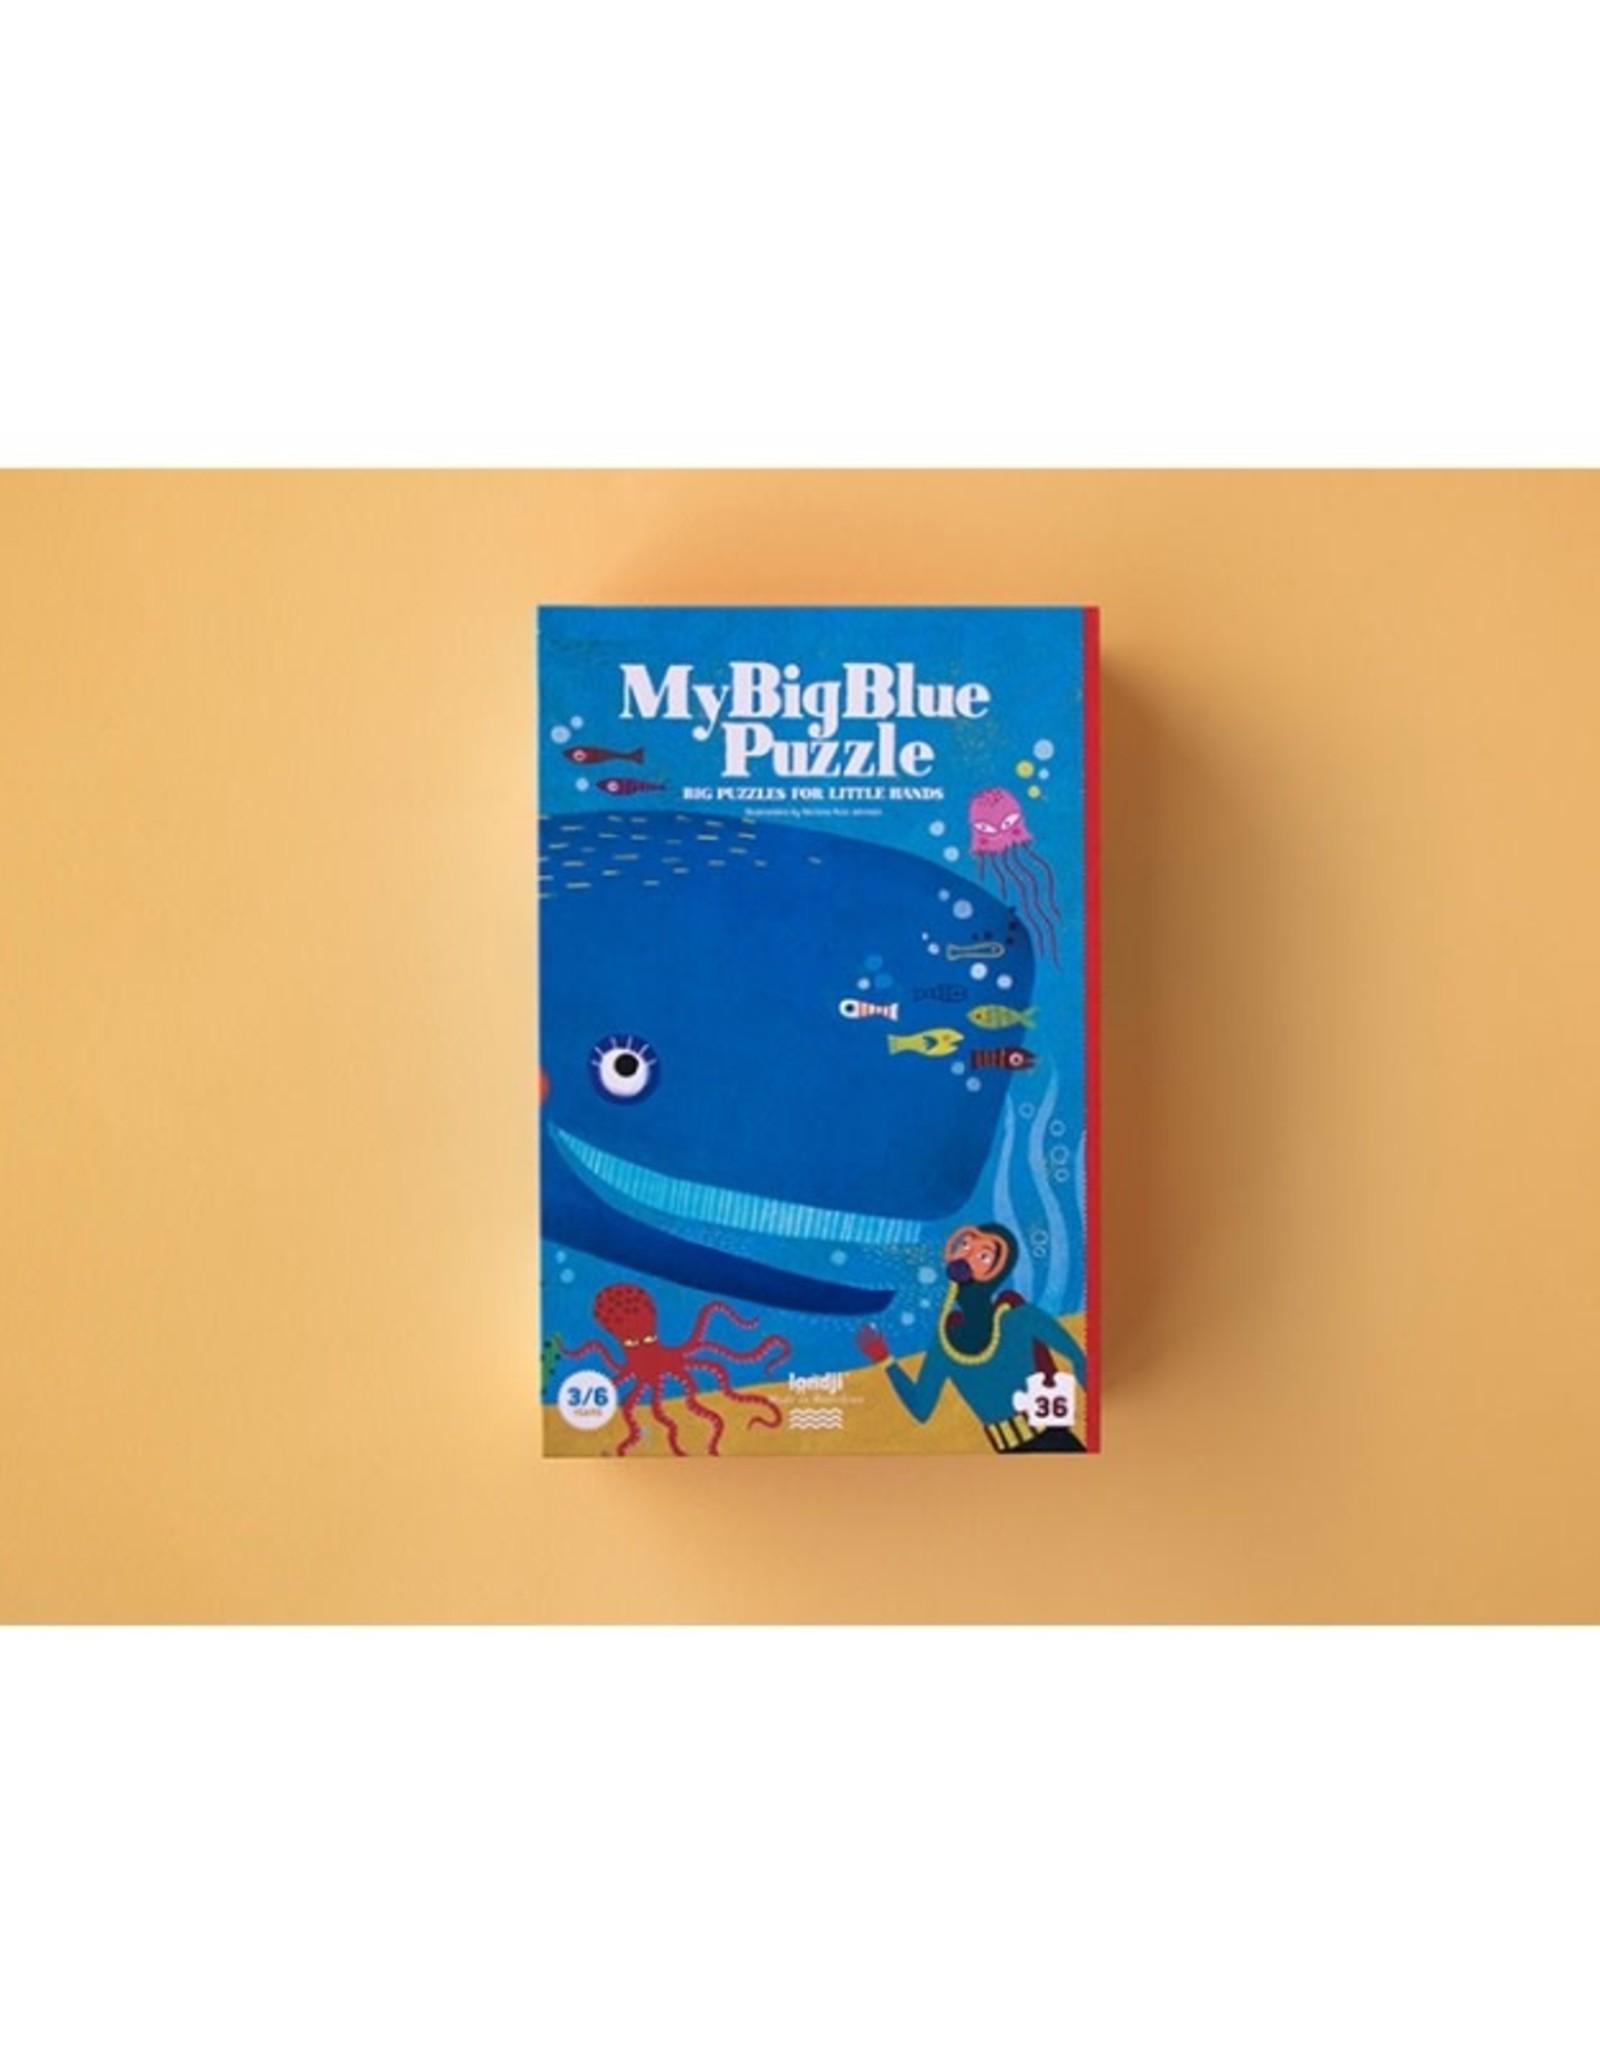 My Big Blue Puzzle, 36 pcs